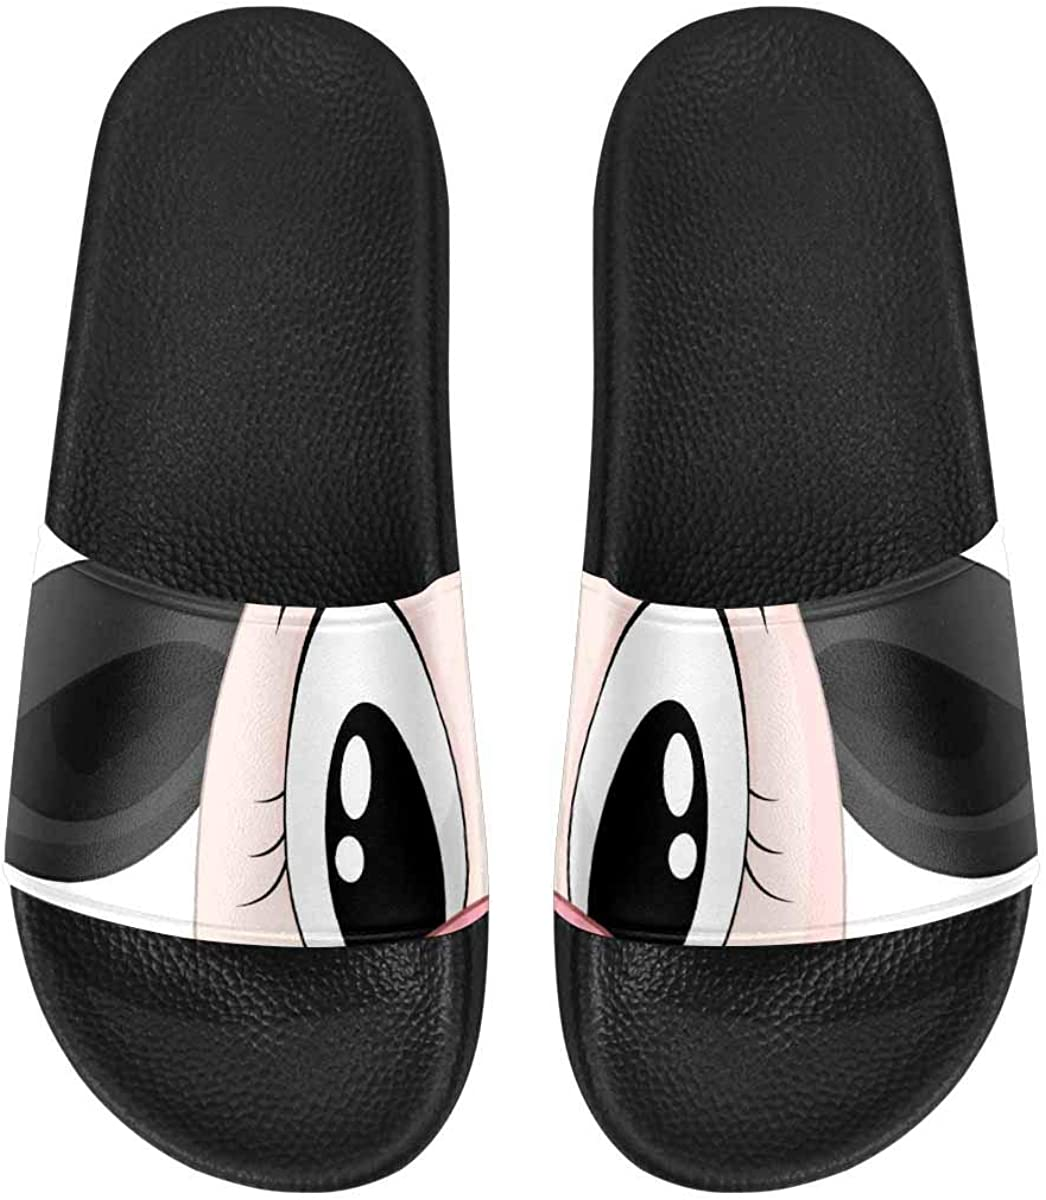 InterestPrint Women's Stylish Slipper Sandals for Summer Cats on The White Background